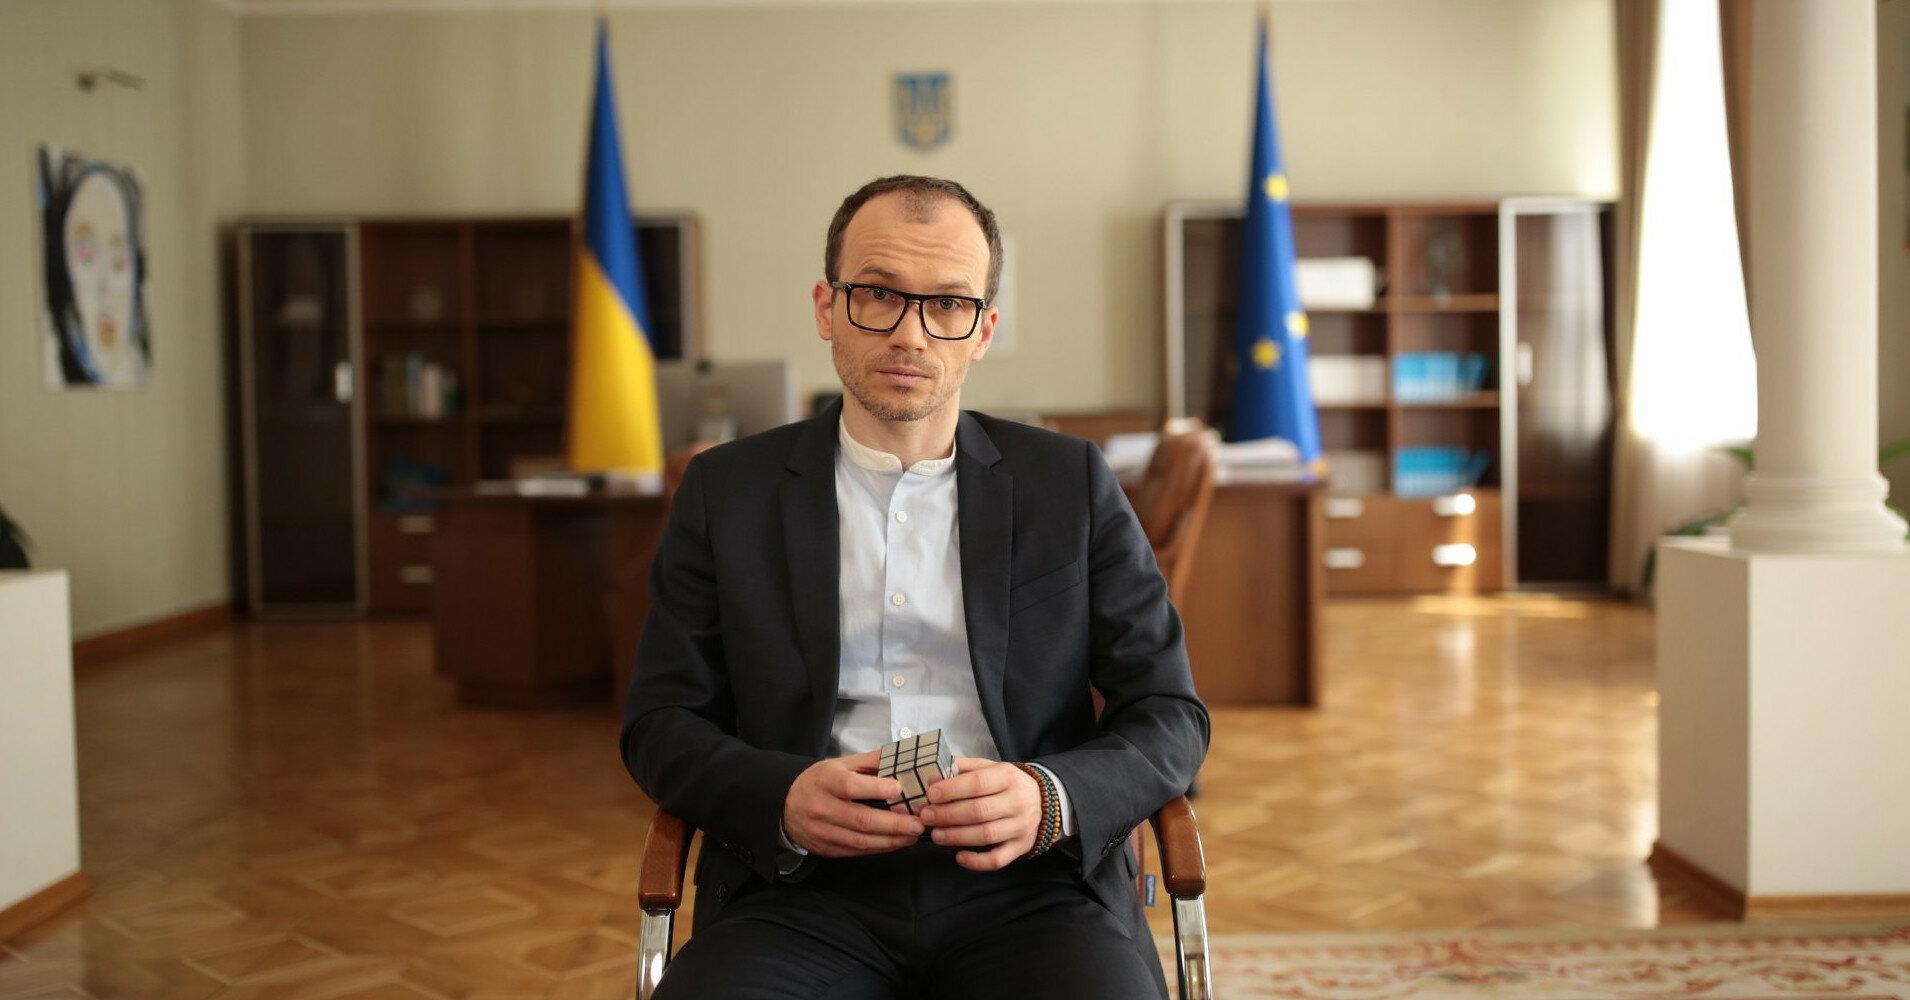 Малюська пообещал проблемы за рубежом украинским олигархам